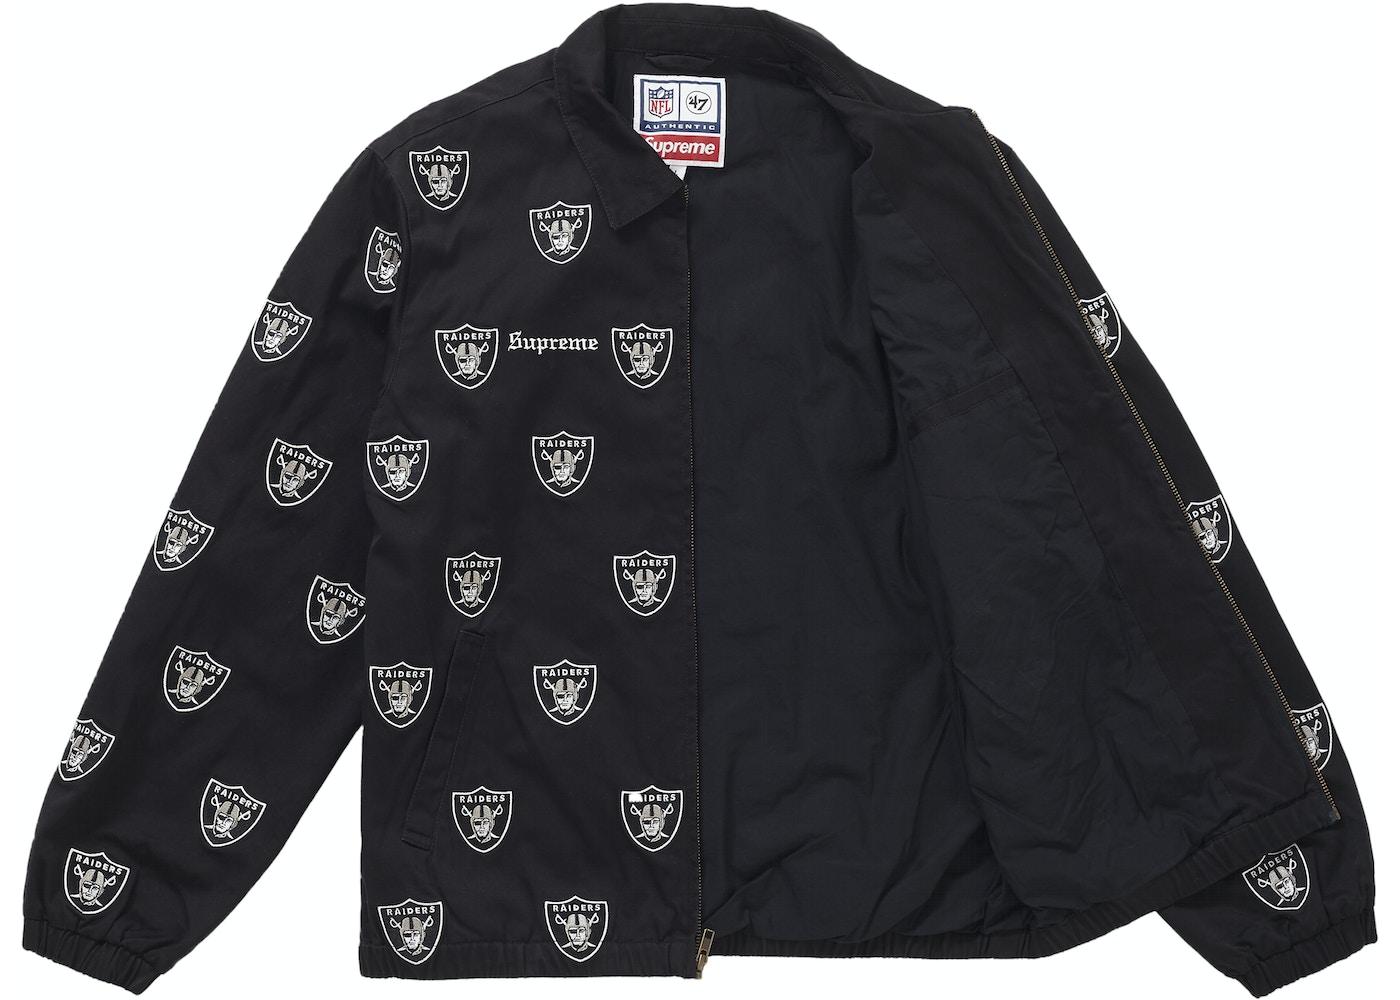 best service 32cb5 ee2d9 Supreme NFL x Raiders x '47 Embroidered Harrington Jacket Black